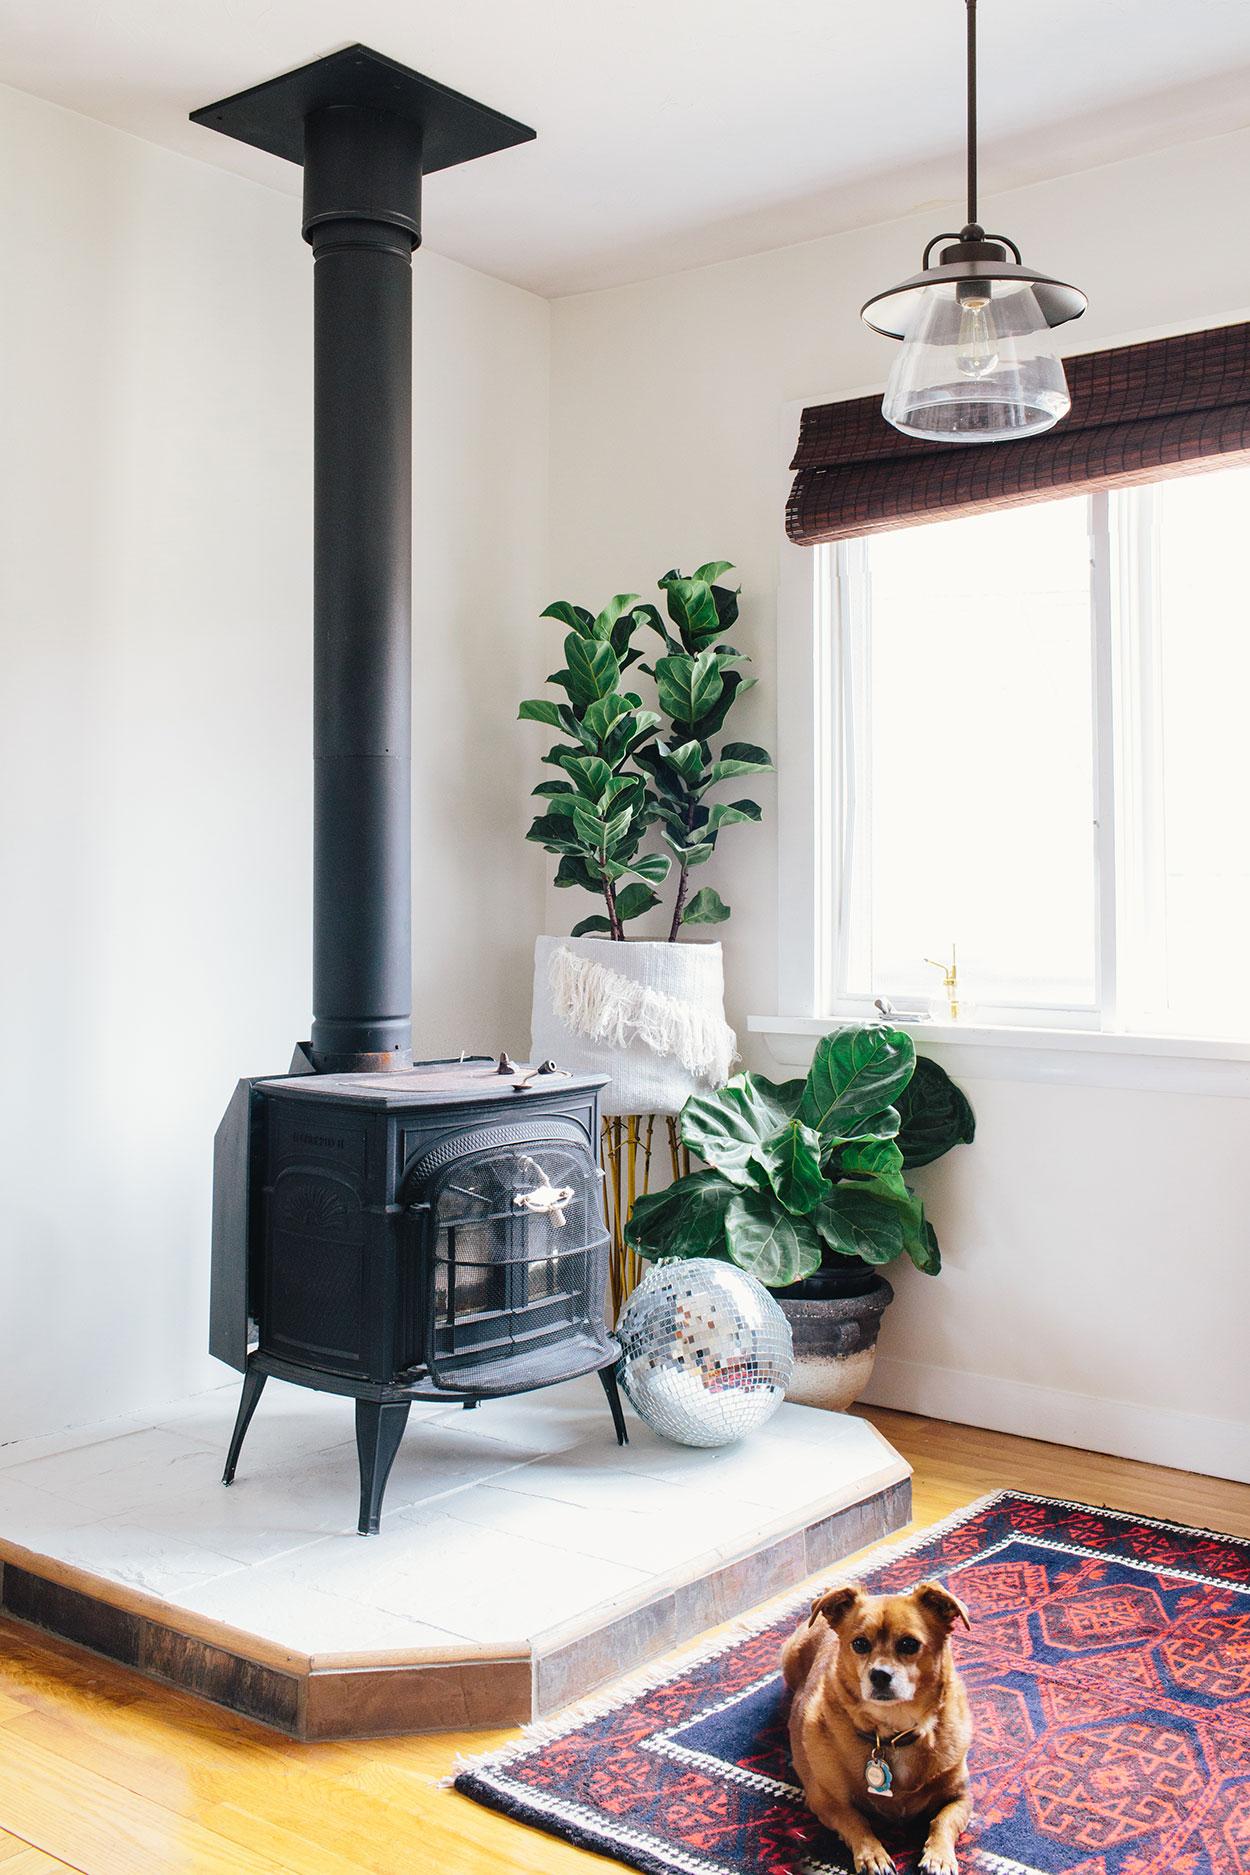 #farmhousedialfano living room / circa early 2015 on design*sponge / photo by  joyelle west